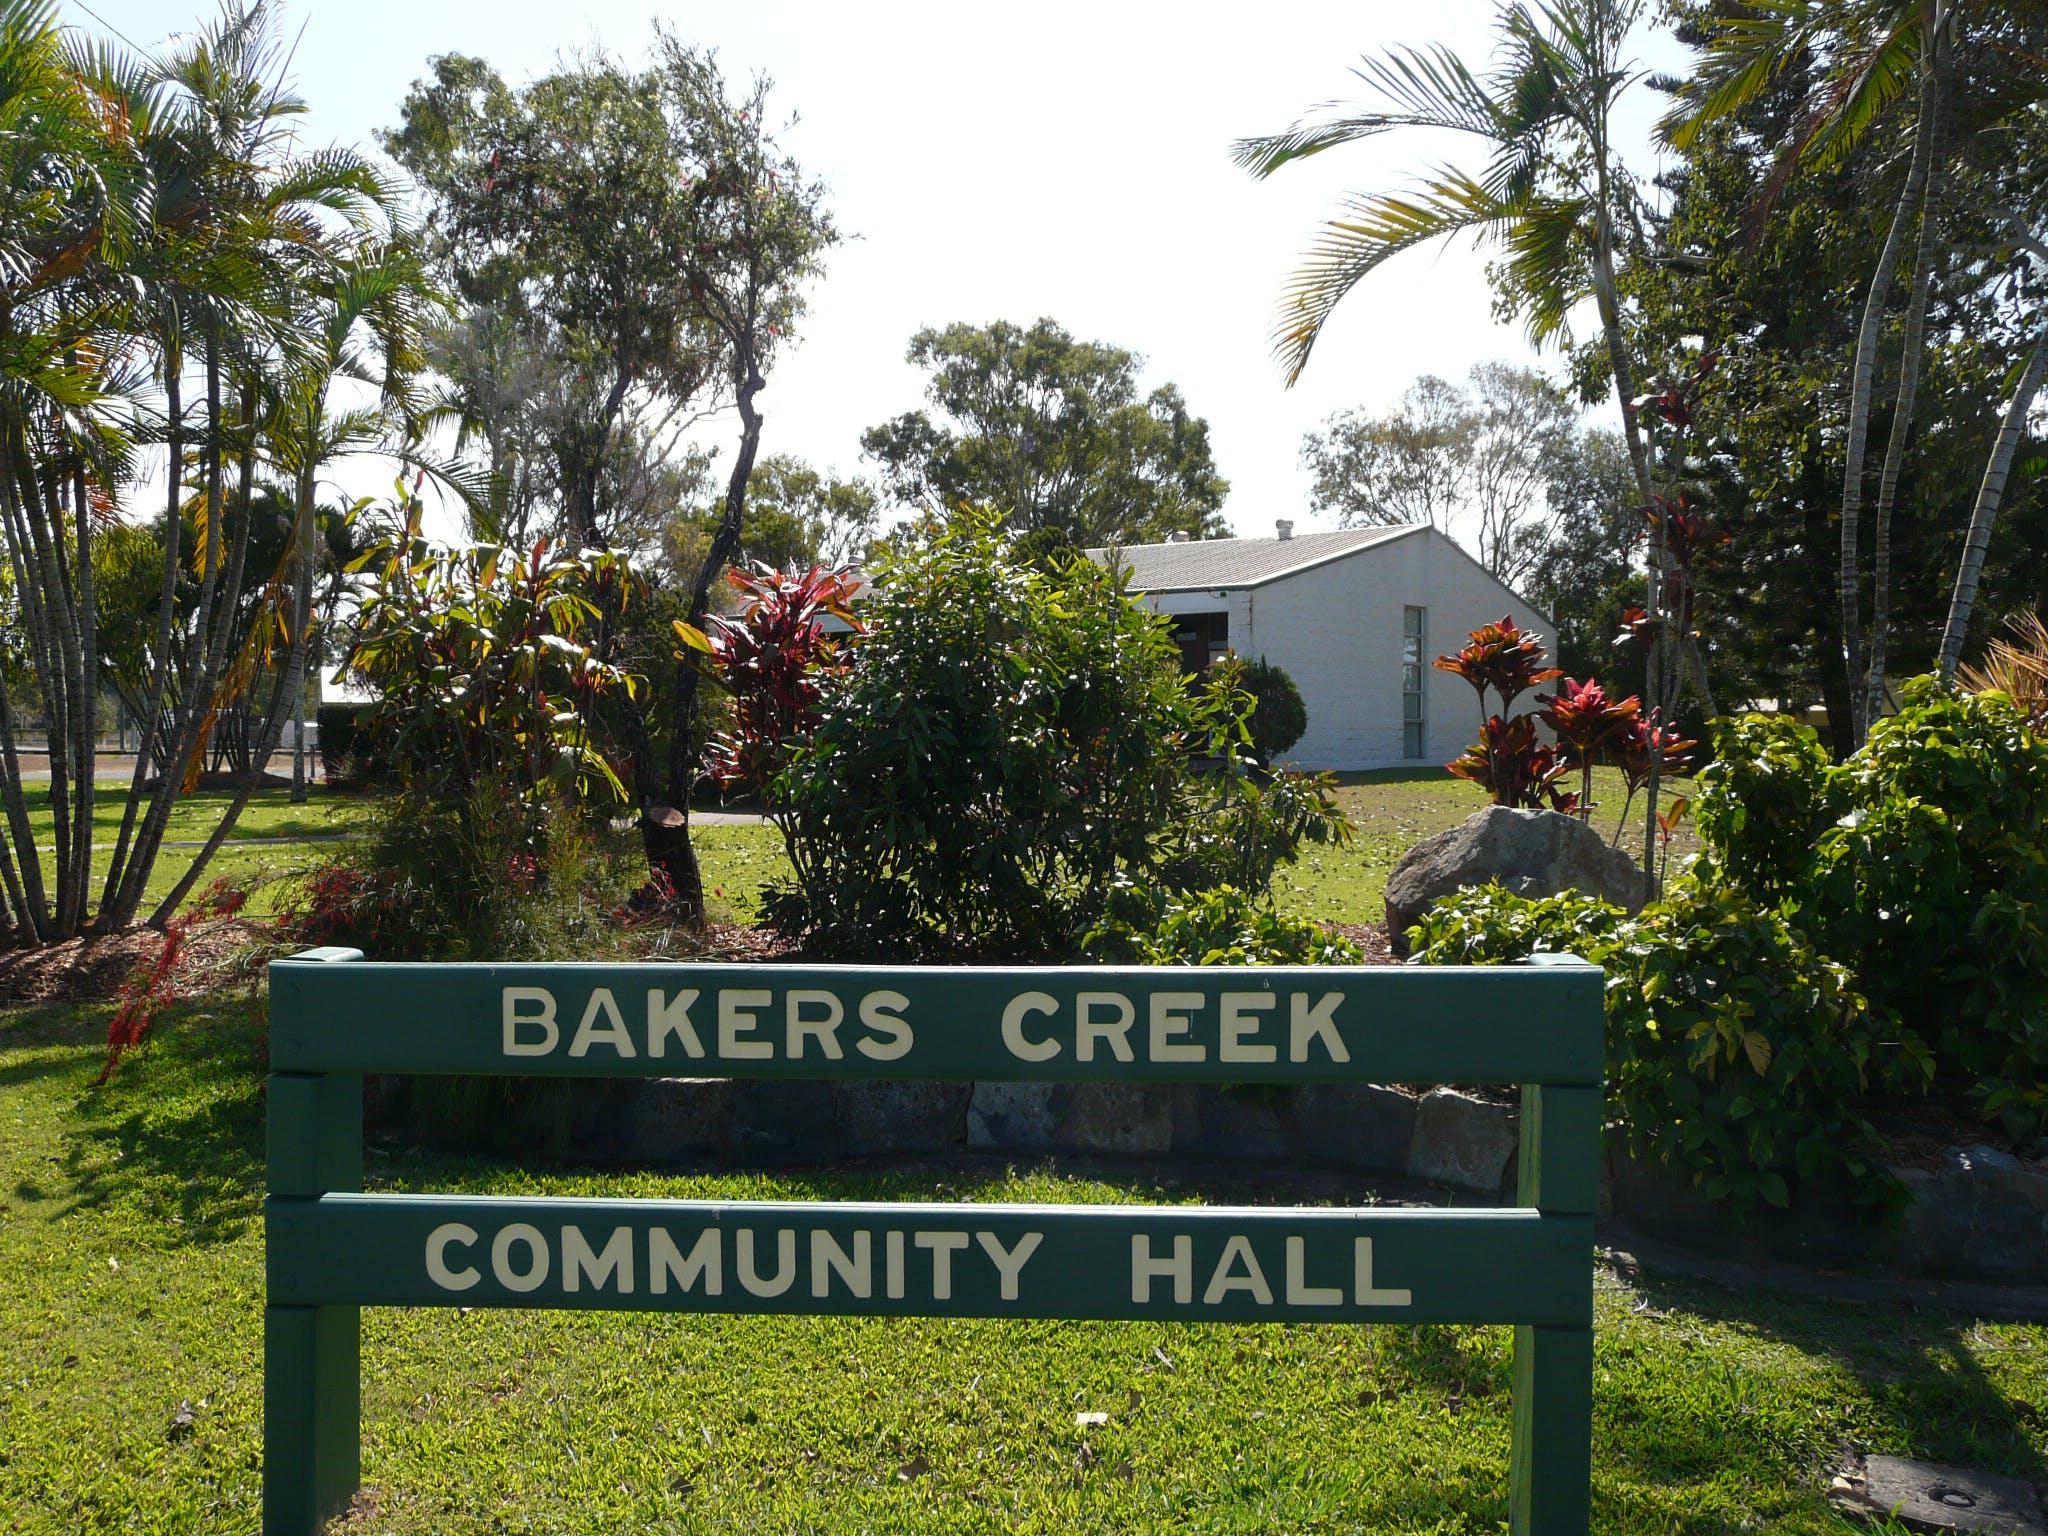 Bakers Creek Community Hall